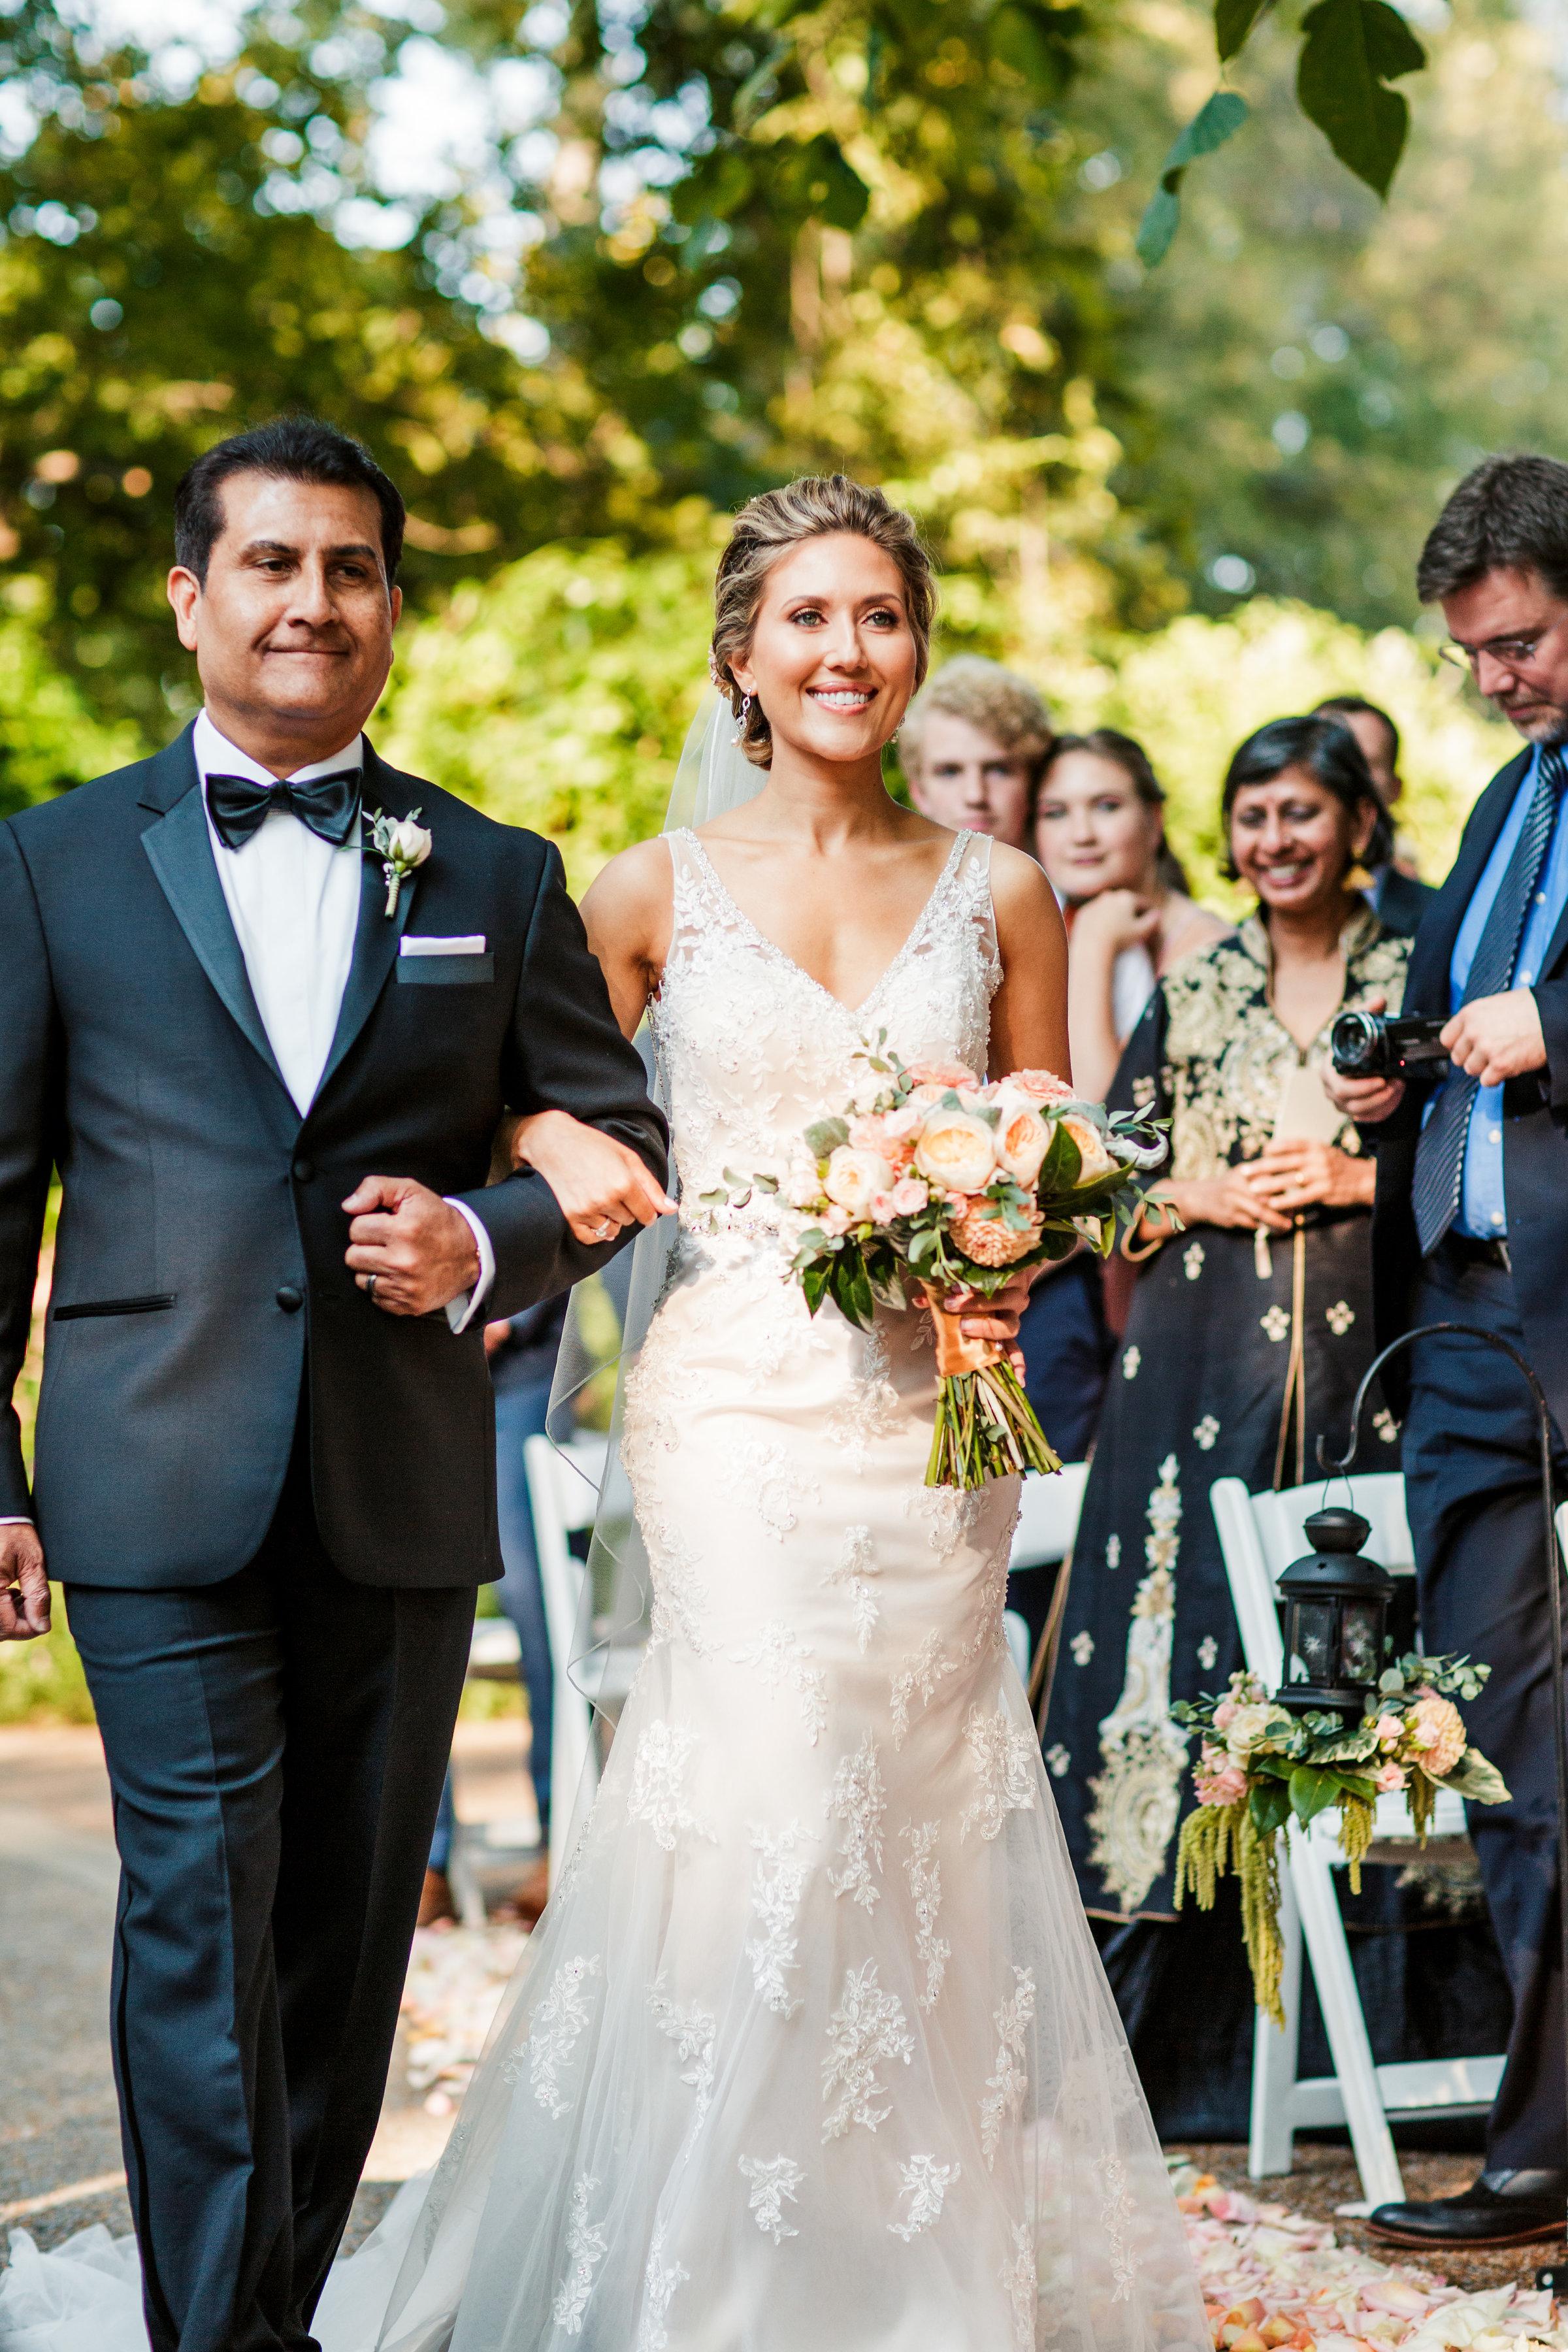 Riverwood-Mansion-Wedding12.jpg